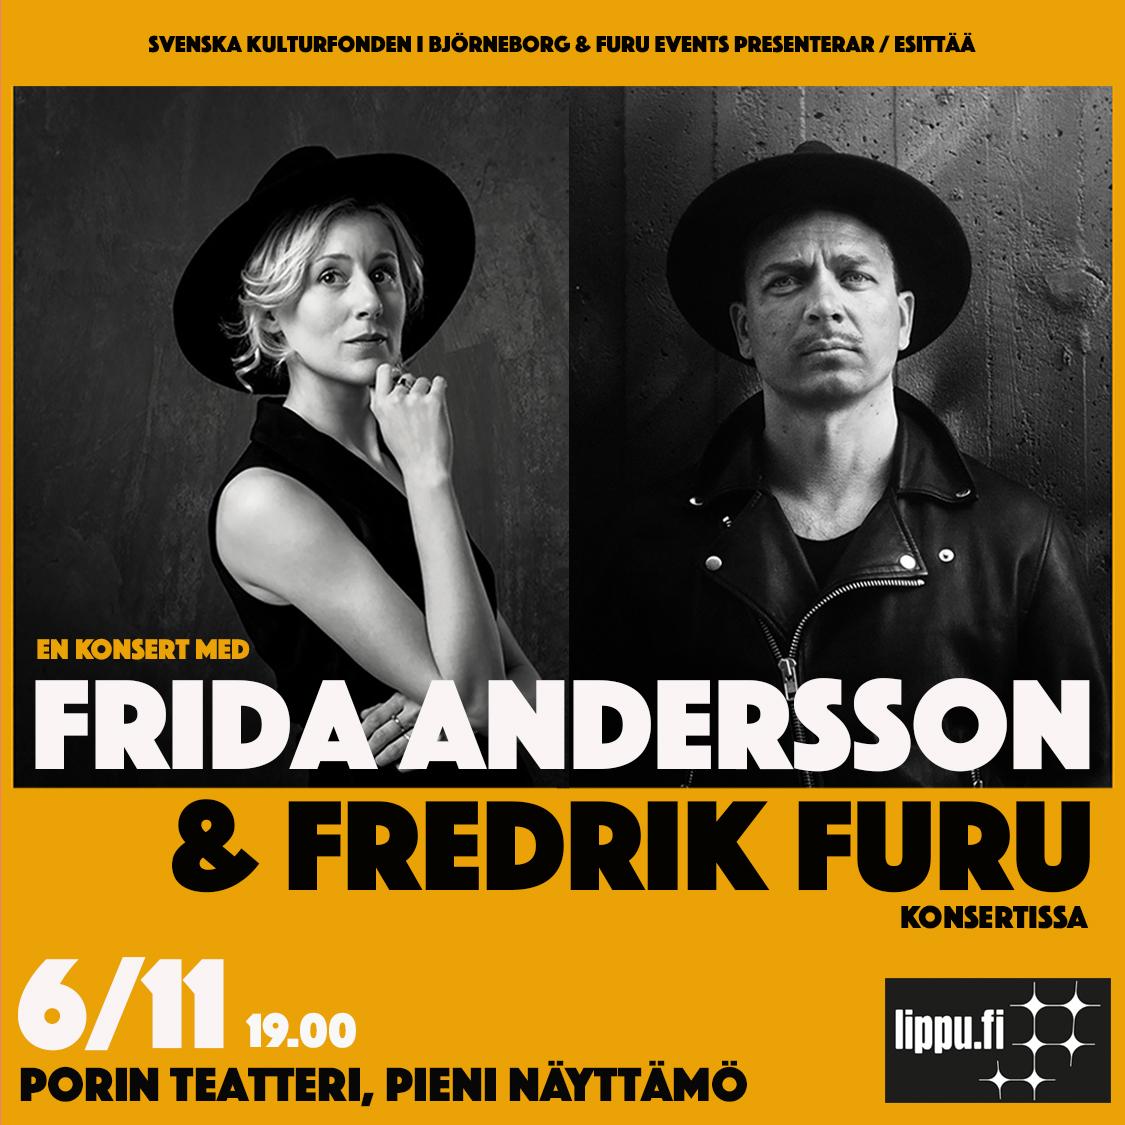 Frida Andersson & Fredrik Furu Konsertissa